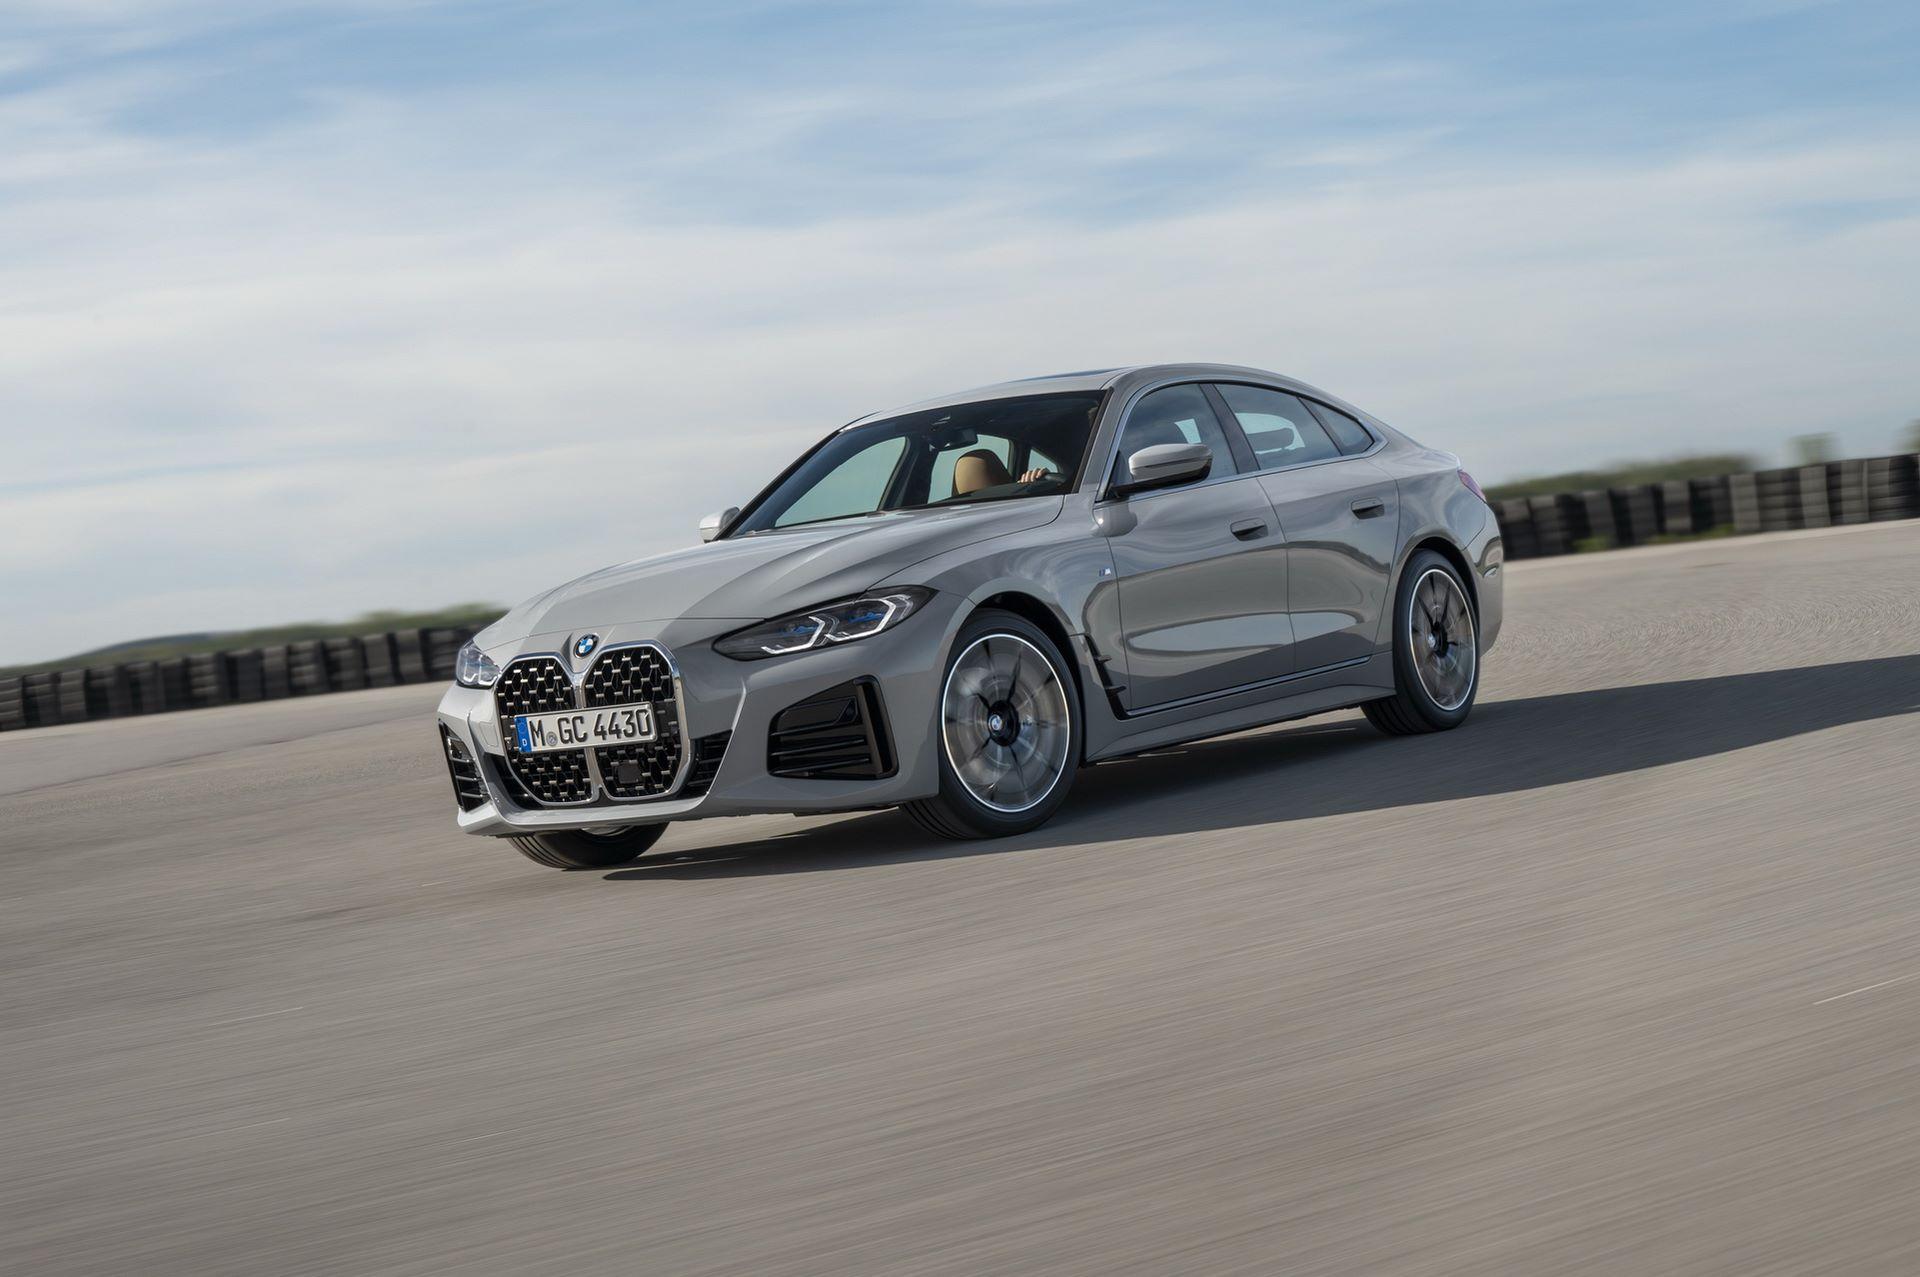 BMW-4-Series-Gran-Coupe-52